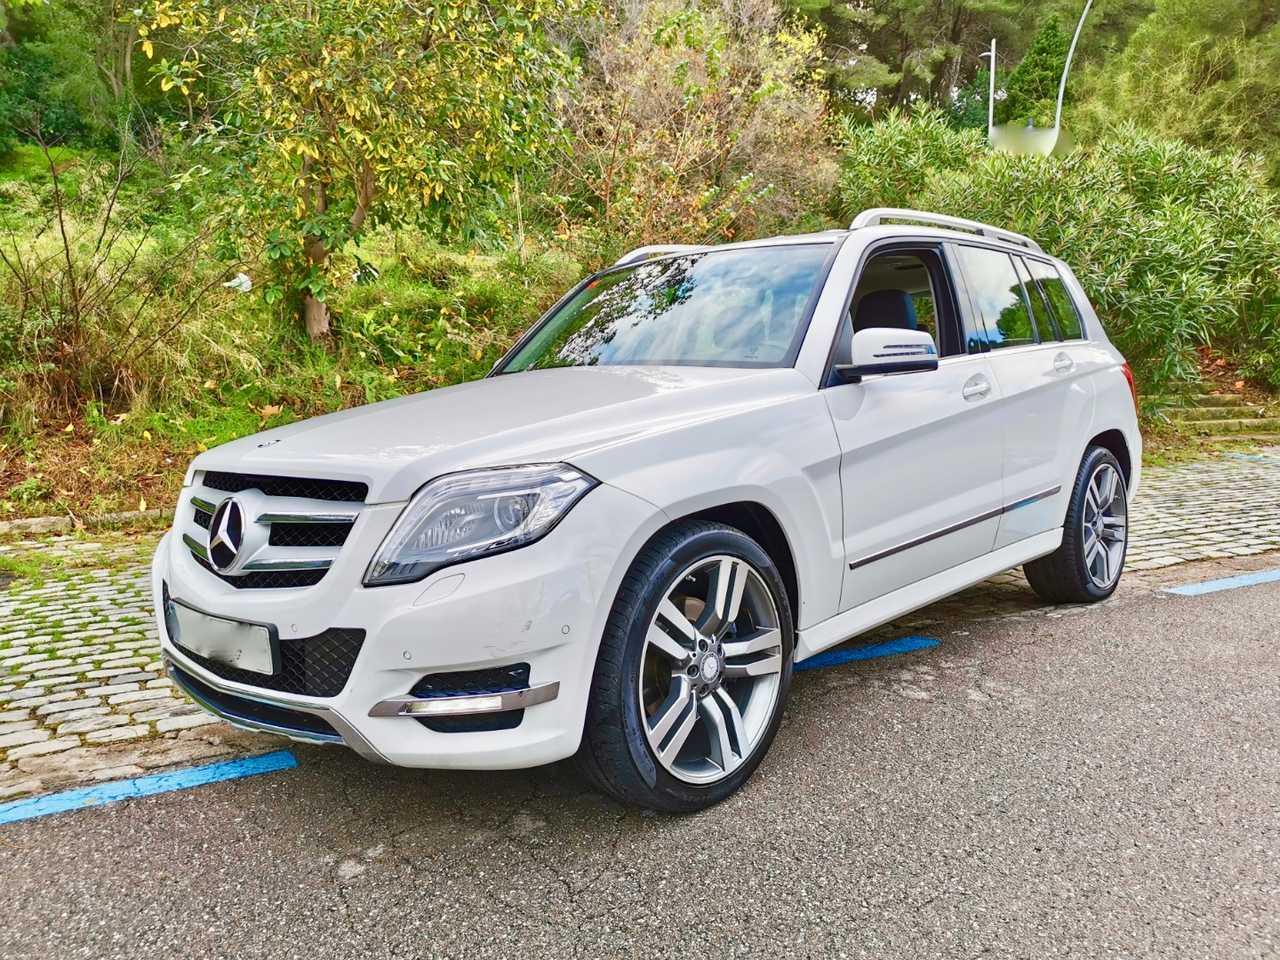 Mercedes Clase GLK 220 Cdi 4Matic. Nacional. Garantia 2 años Oficial.   - Foto 1